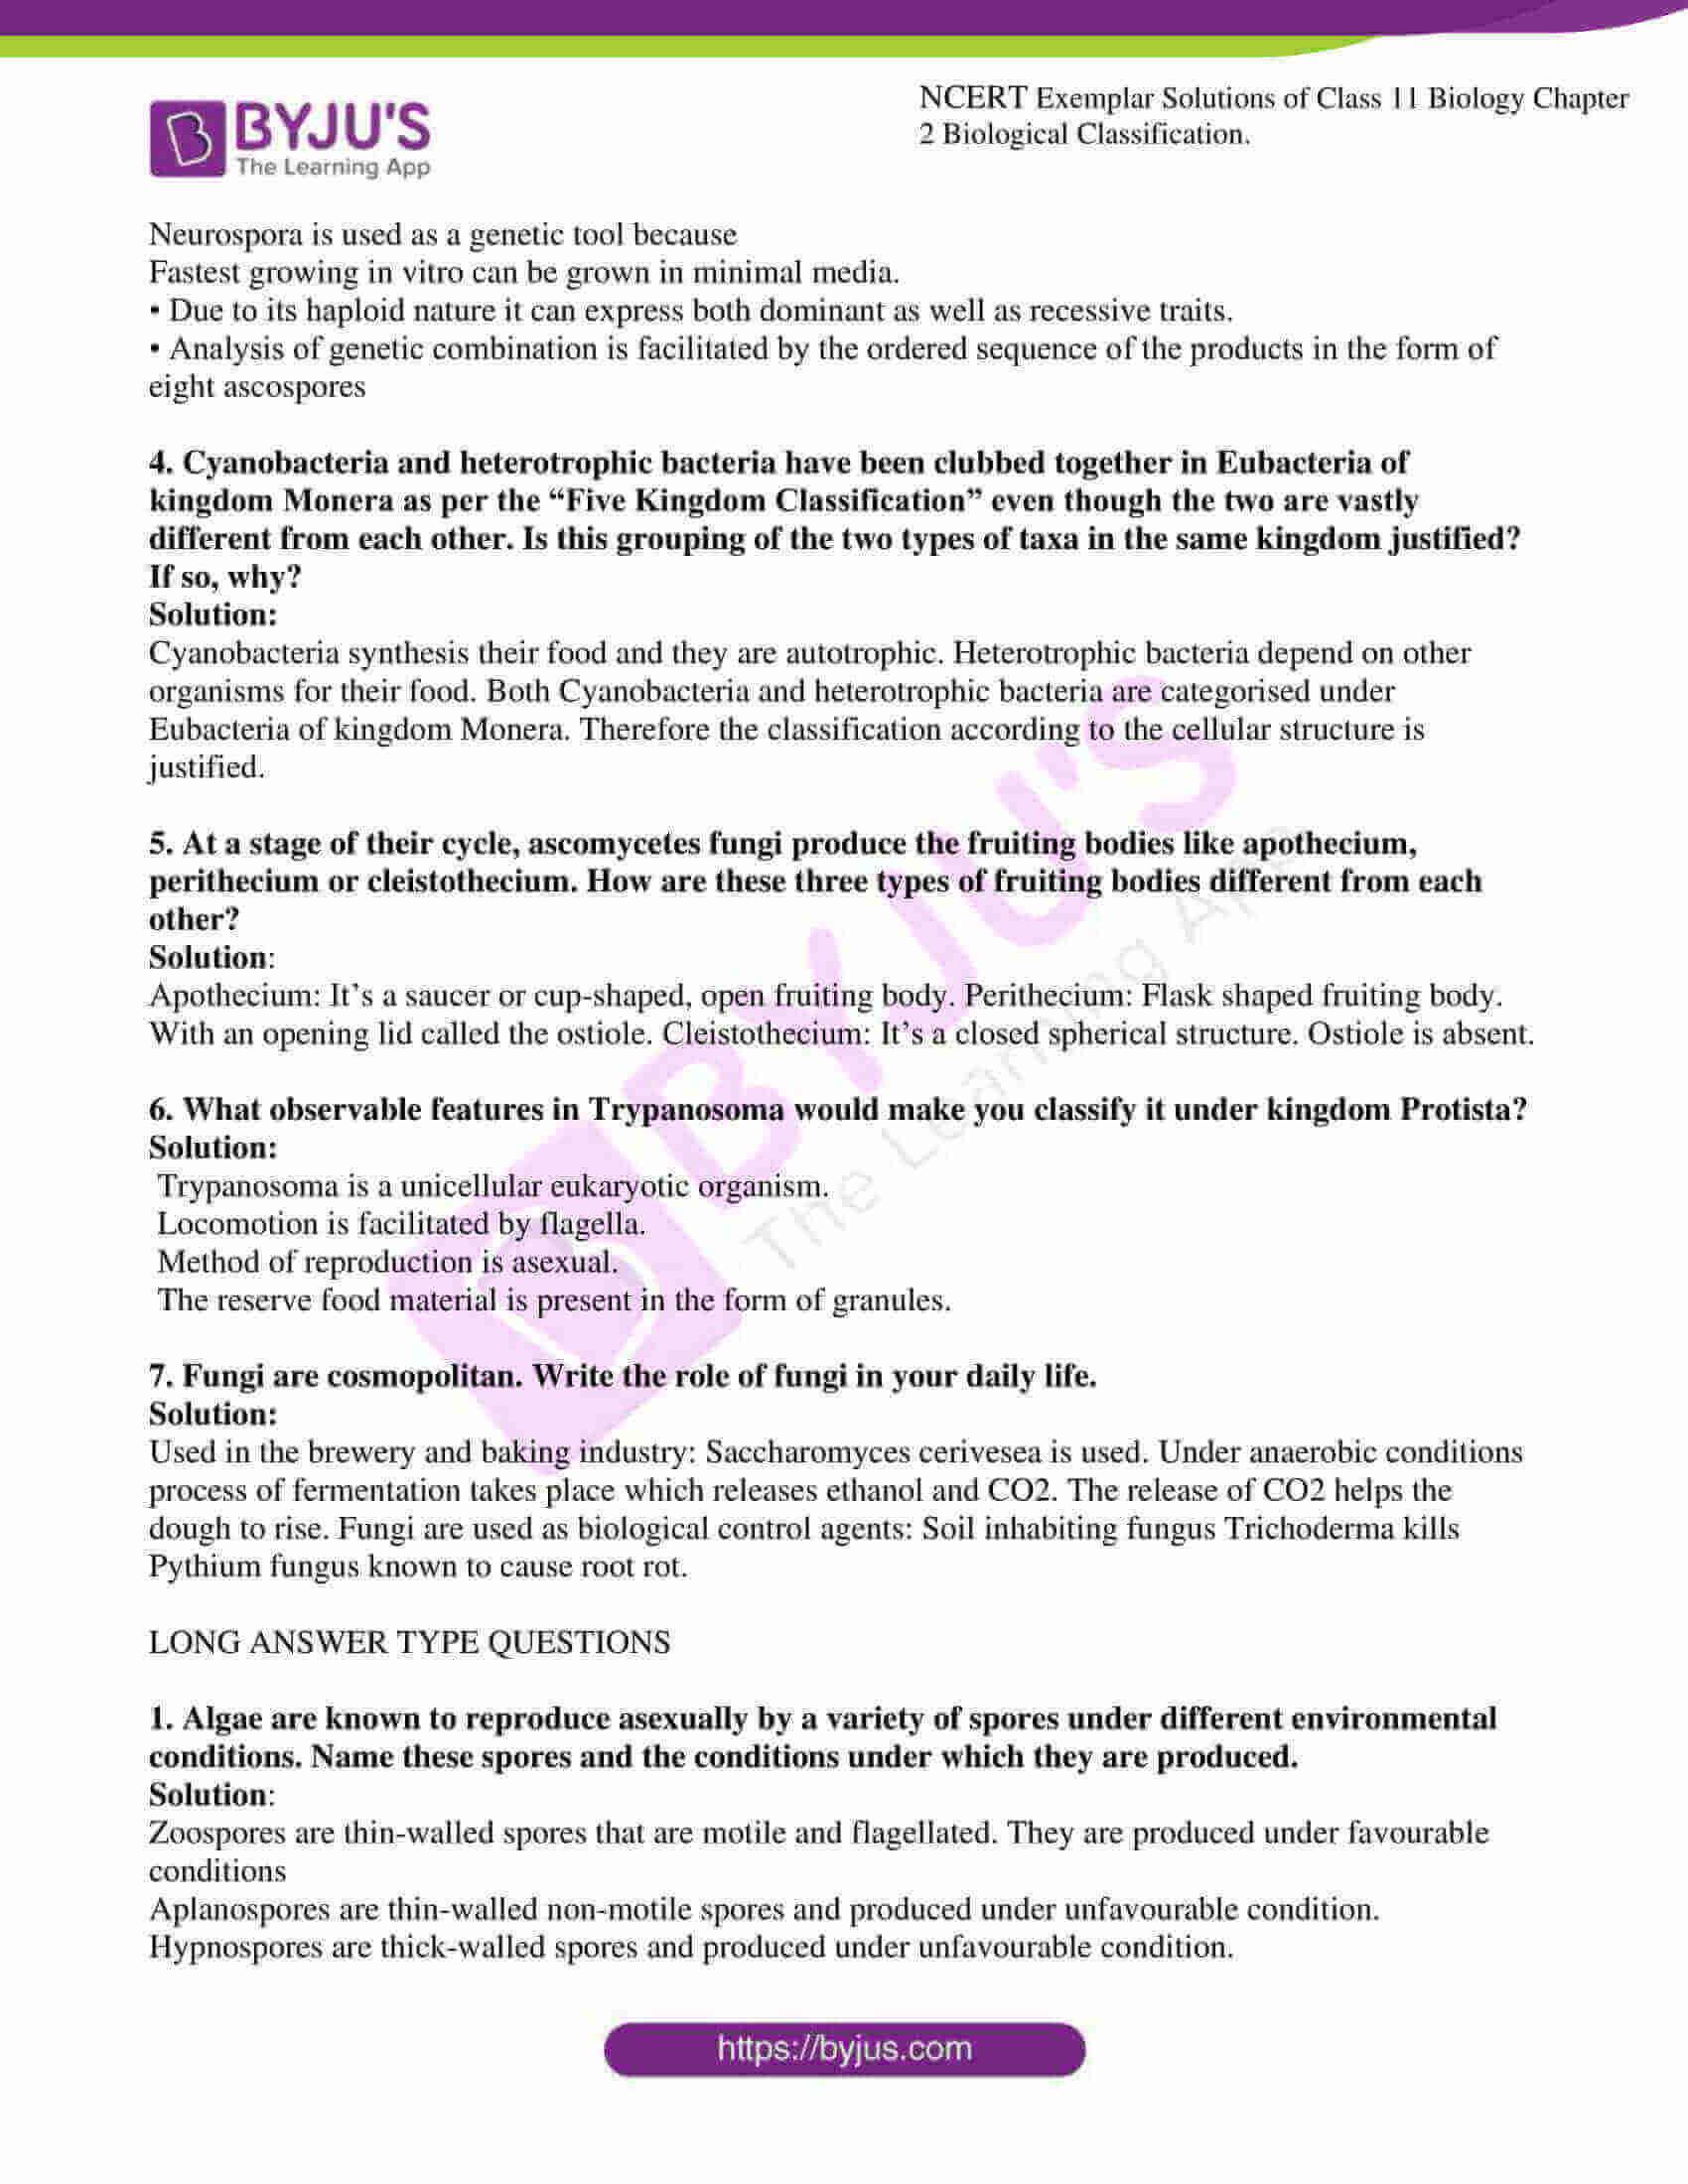 ncert exemplar solutions for class 11 bio chapter 2 5